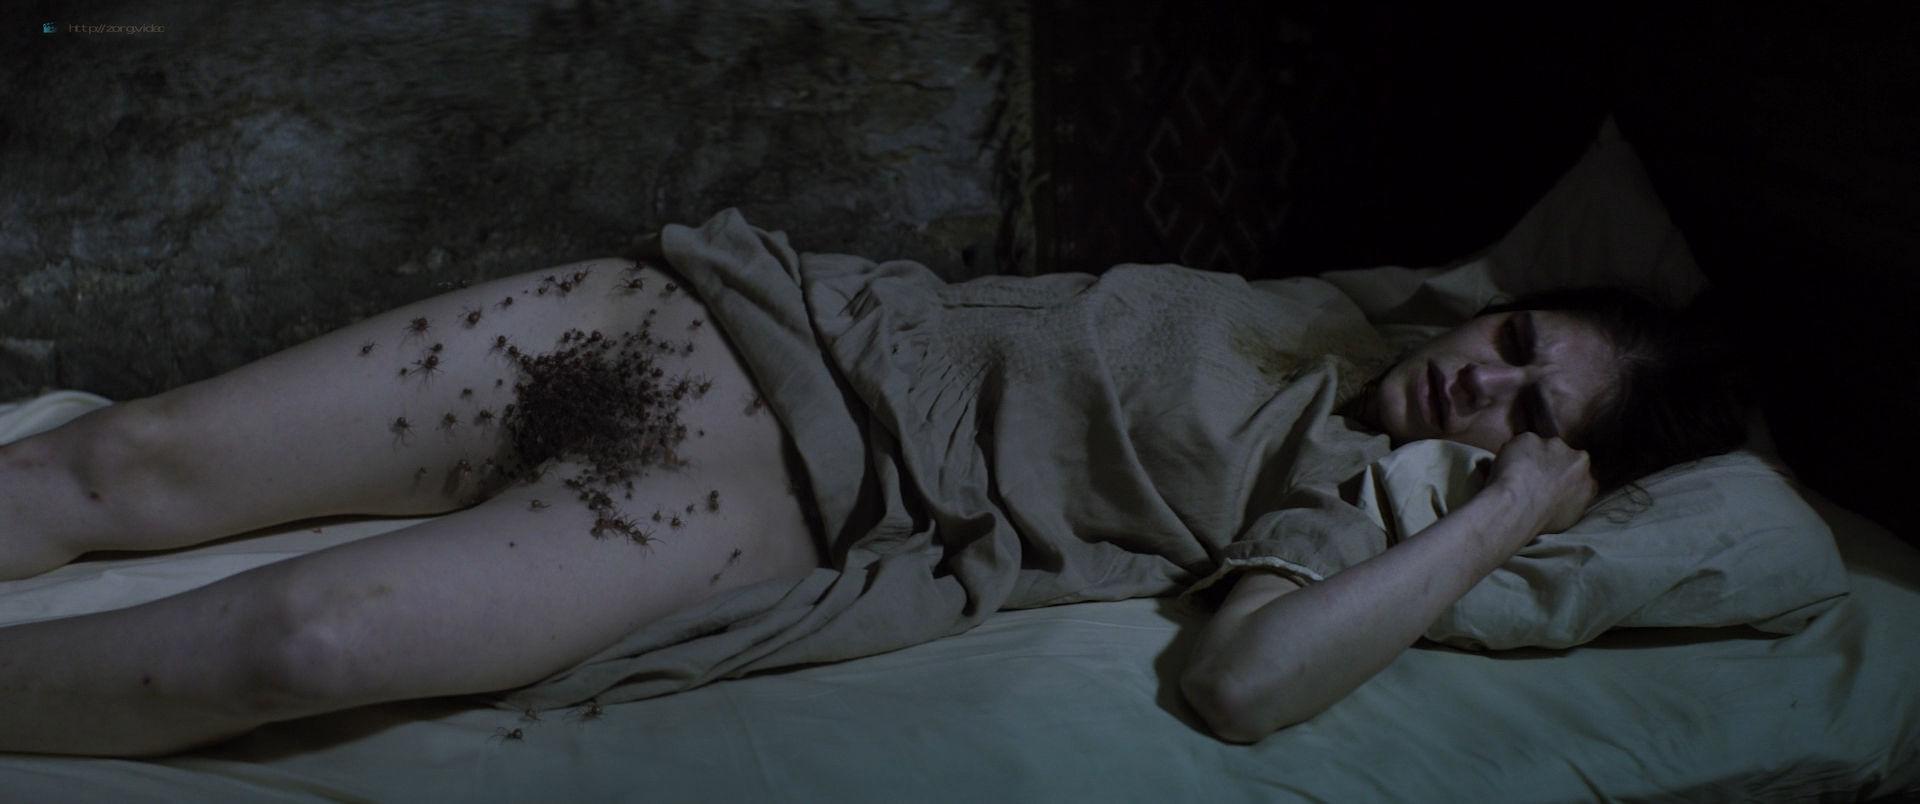 nude-women-of-horror-films-fak-irani-pussy